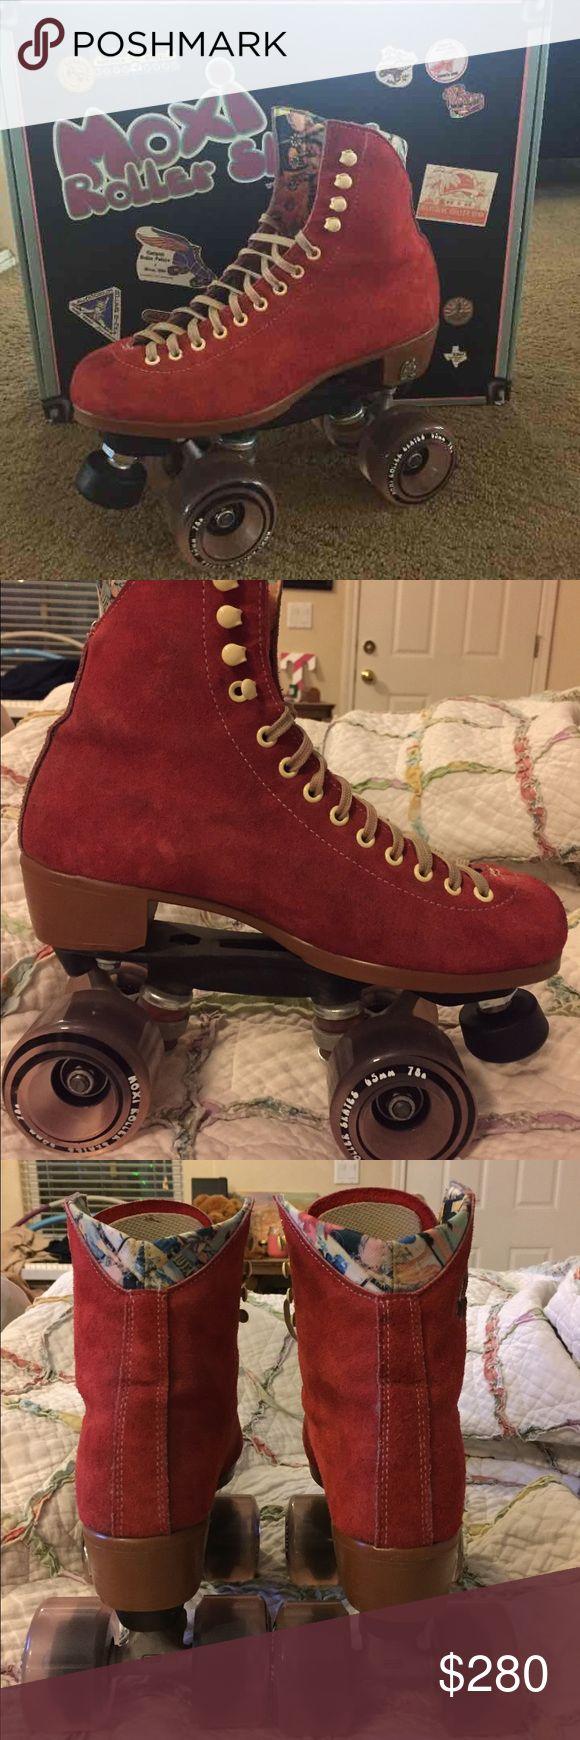 Zumiez roller skates - Moxi Roller Skates Paypal Only Red Poppy Moxi Roller Skates Mens Size 6